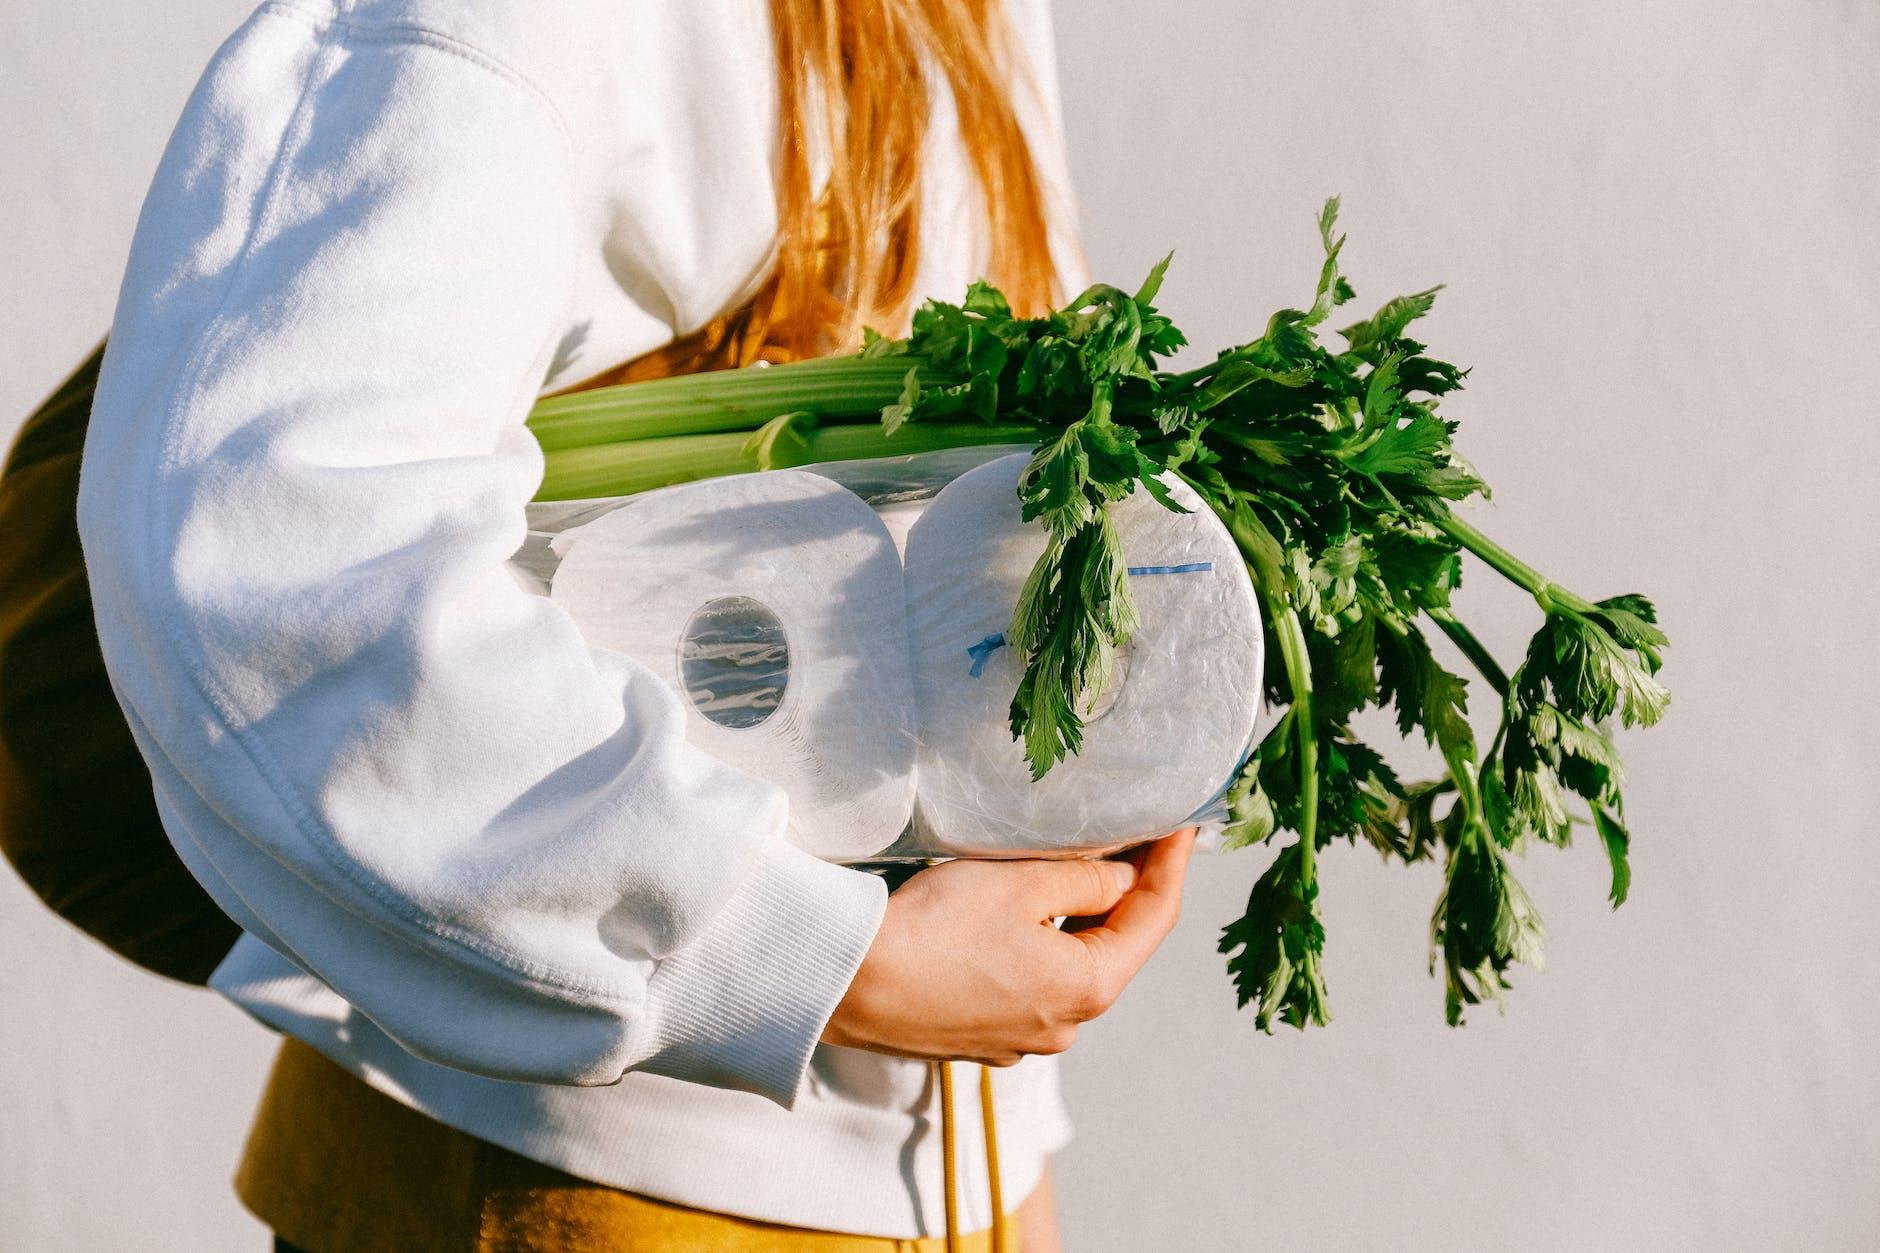 pakai tisu untuk simpan sayur